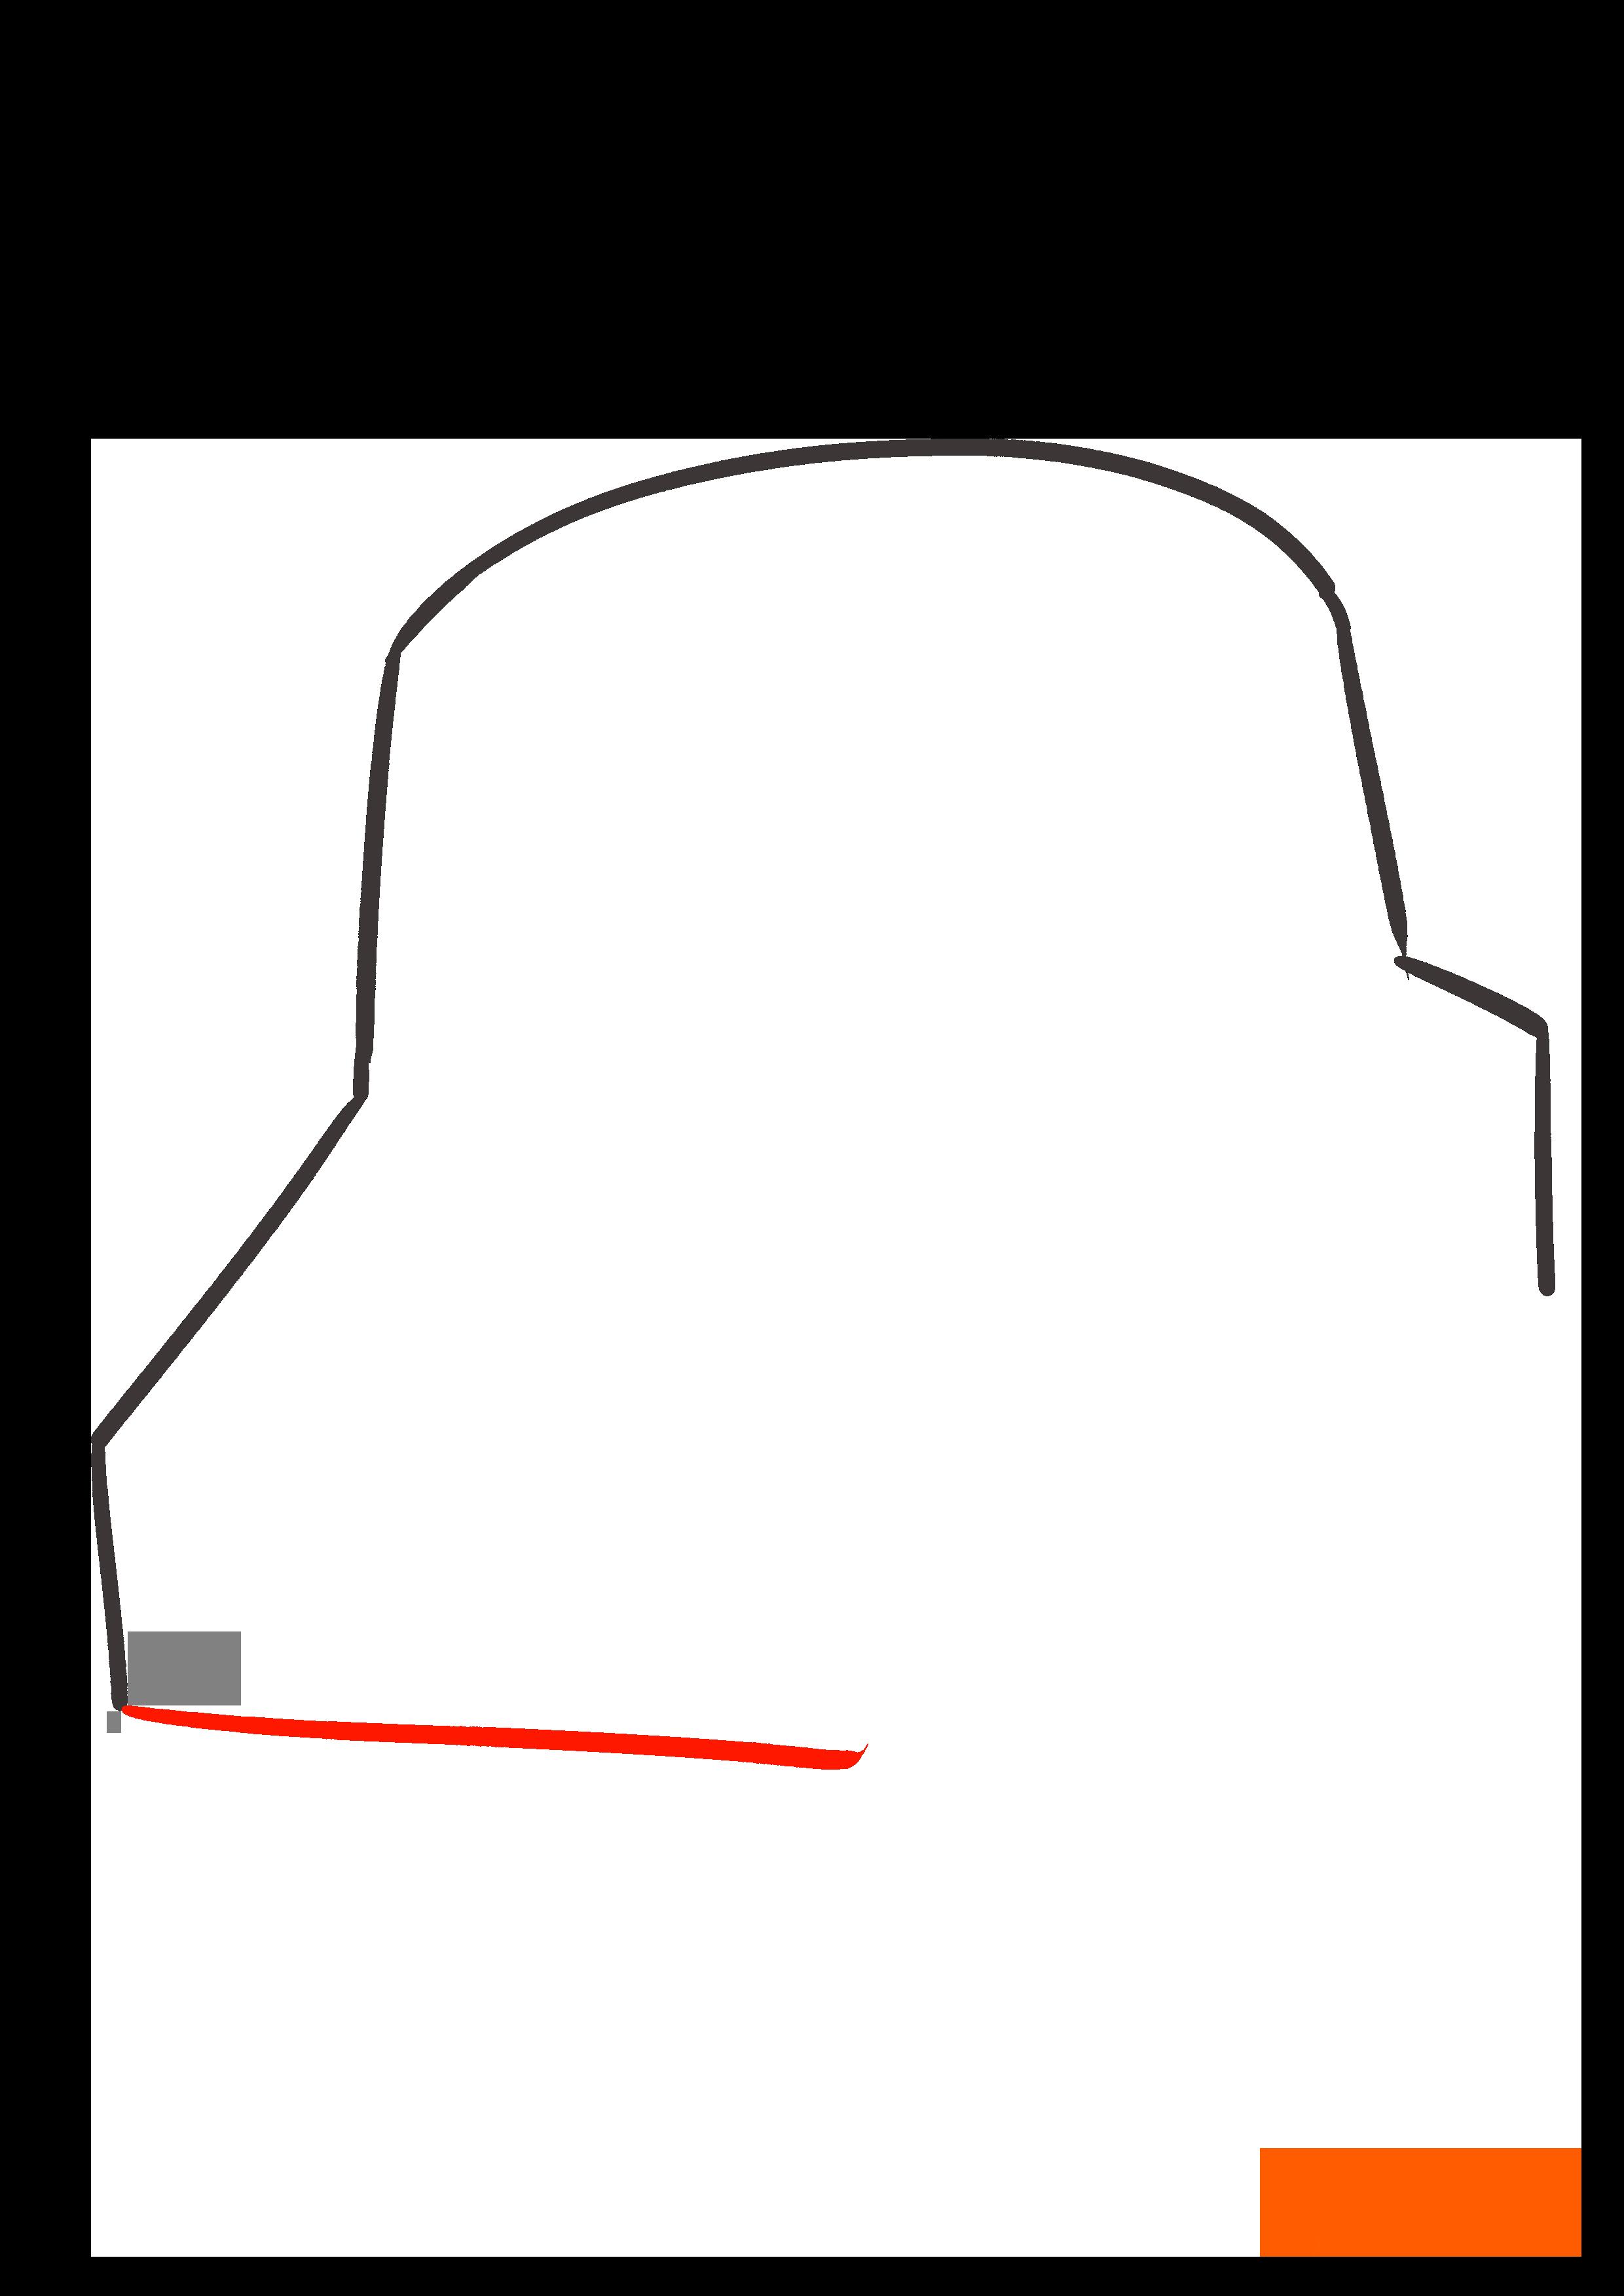 How to draw a cartoon Car?